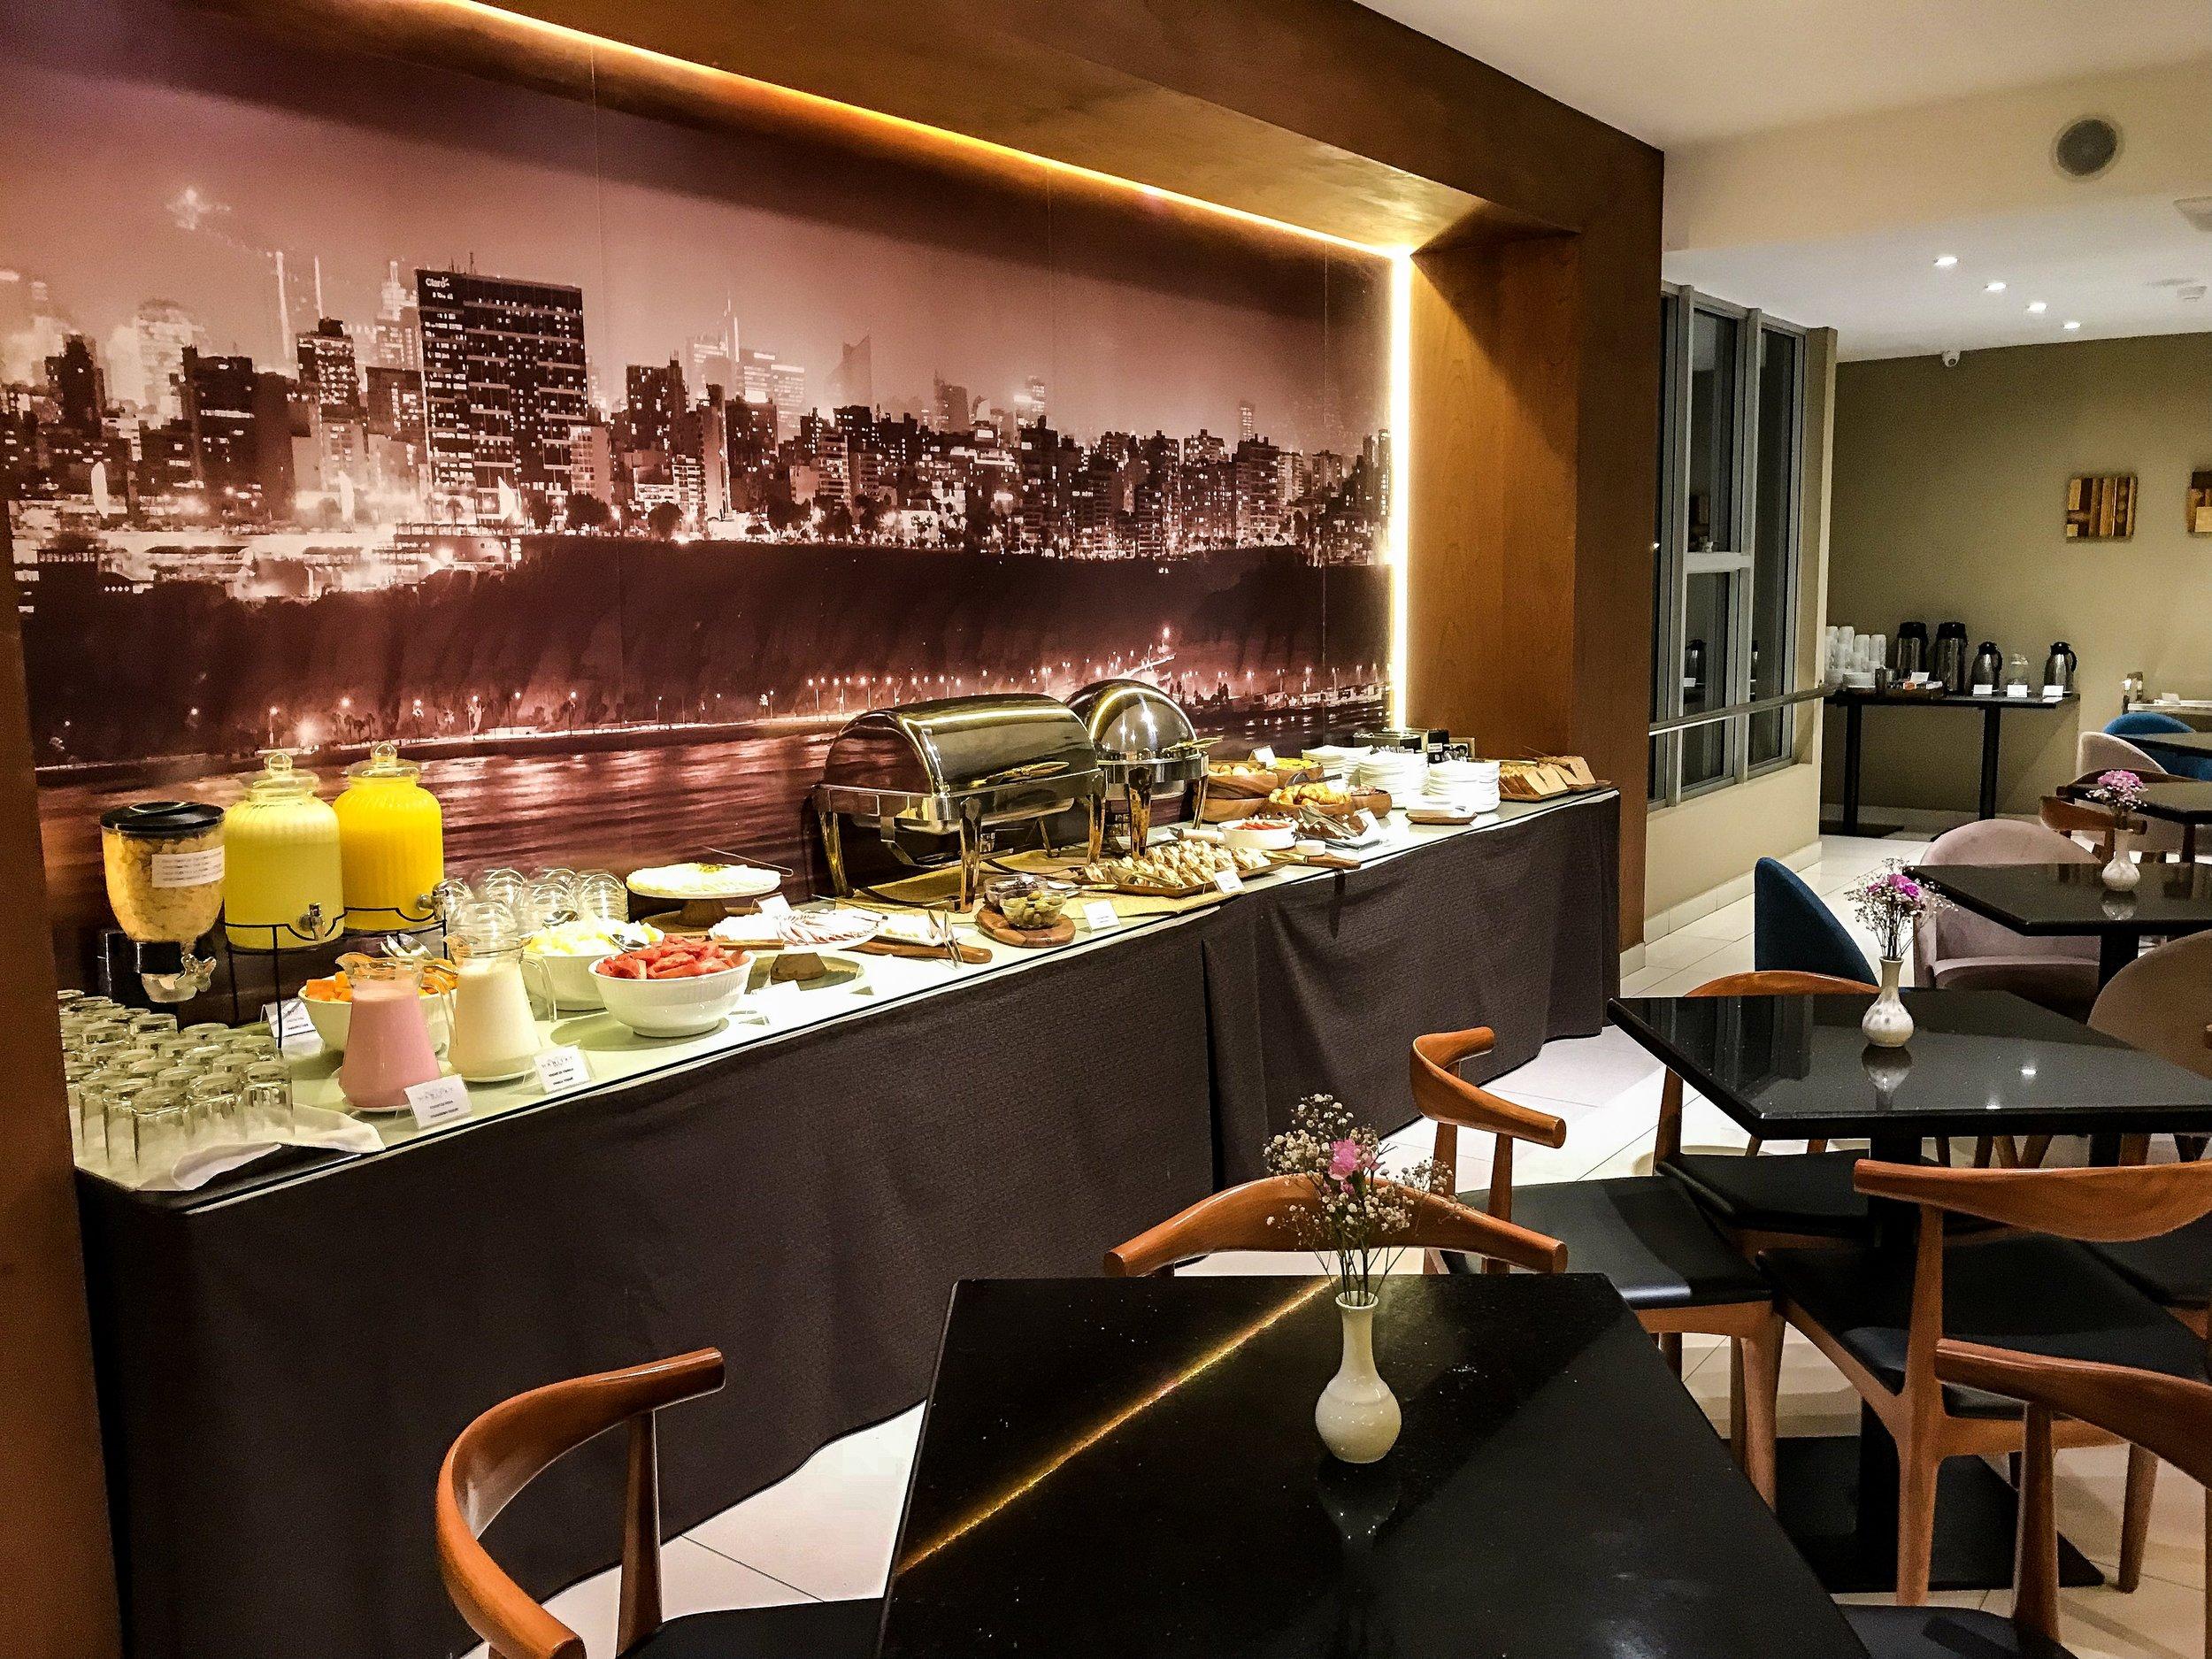 The breakfast room in the Habitat Hotel